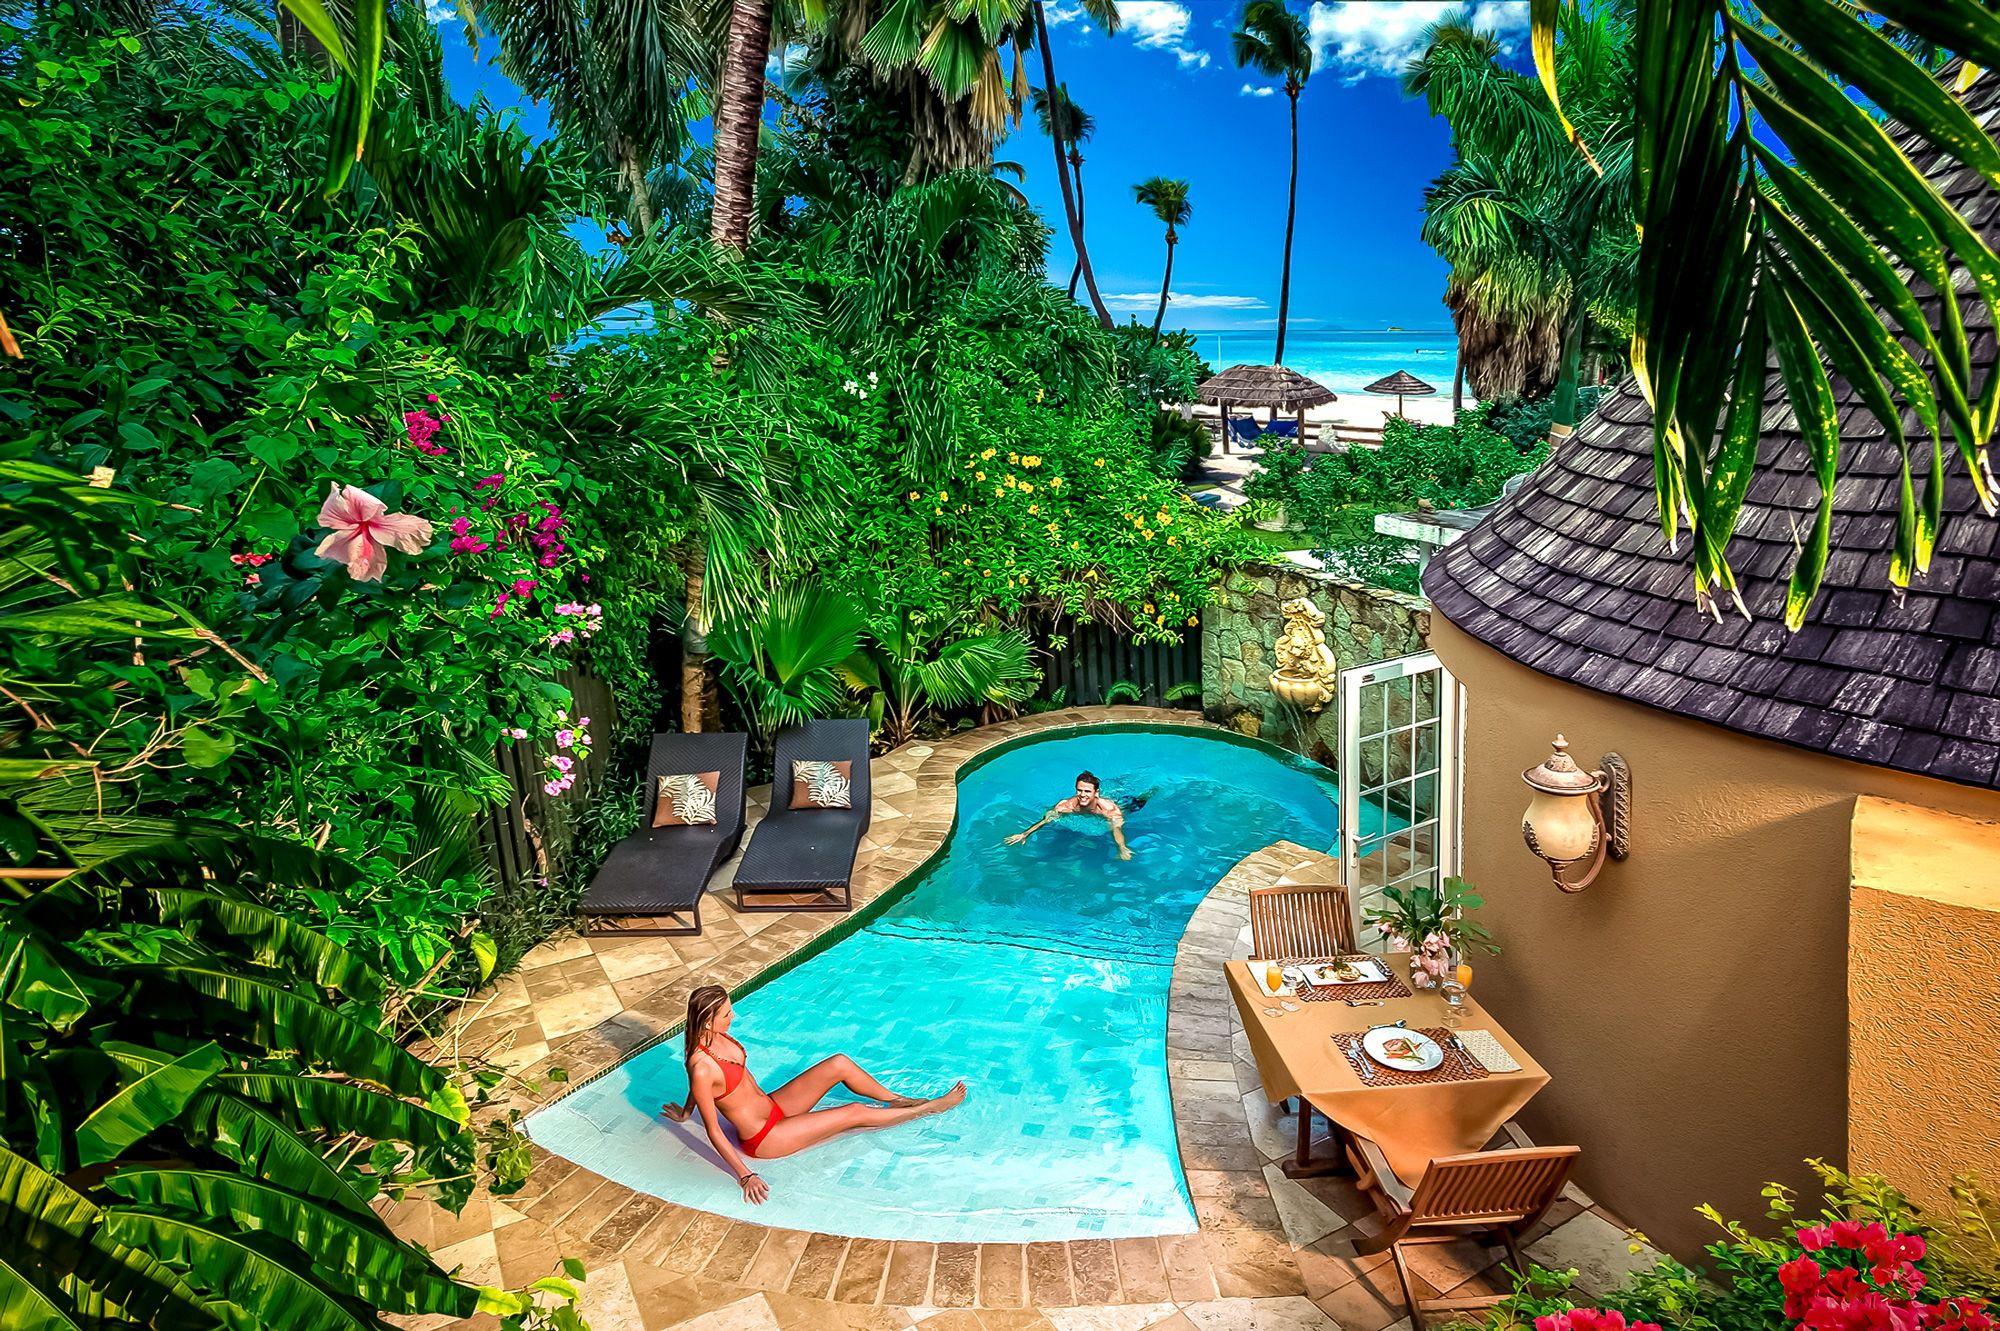 1000+ images about Sandals Ochi Beach Resort on Pinterest